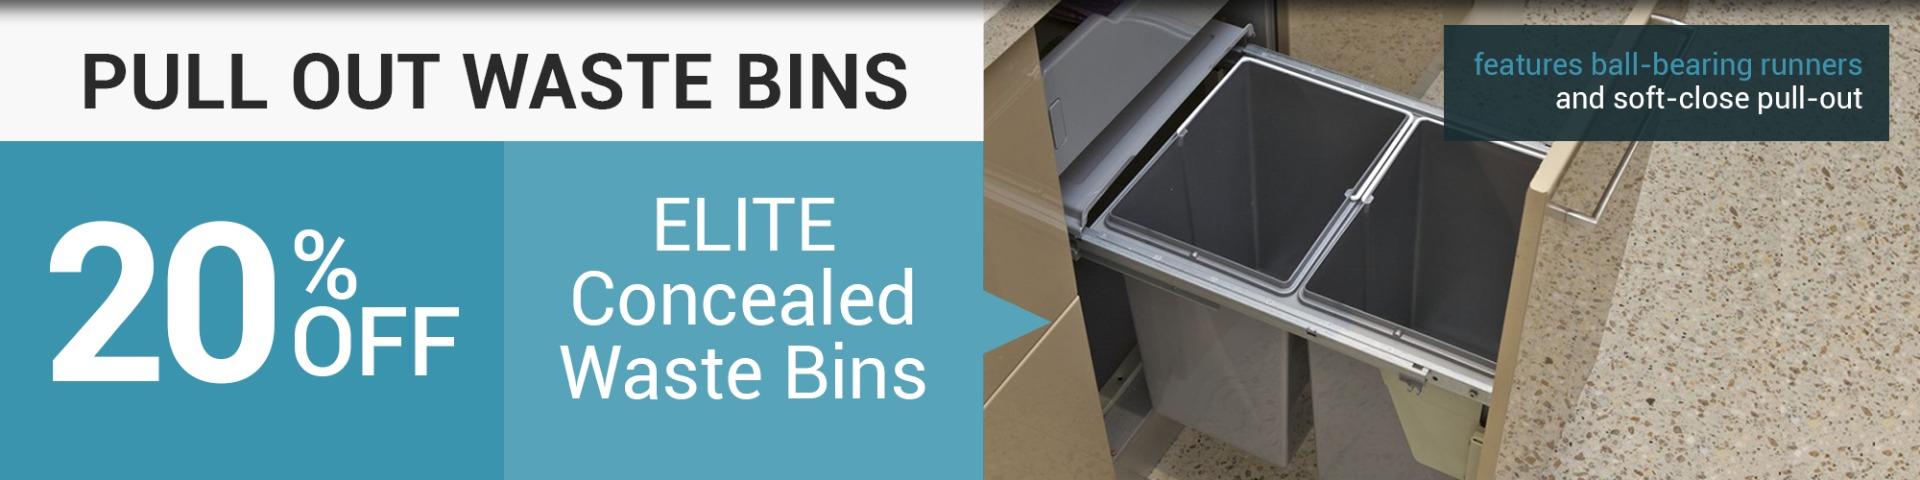 kitchen waste bin sale, pull out bins, rubbish bins